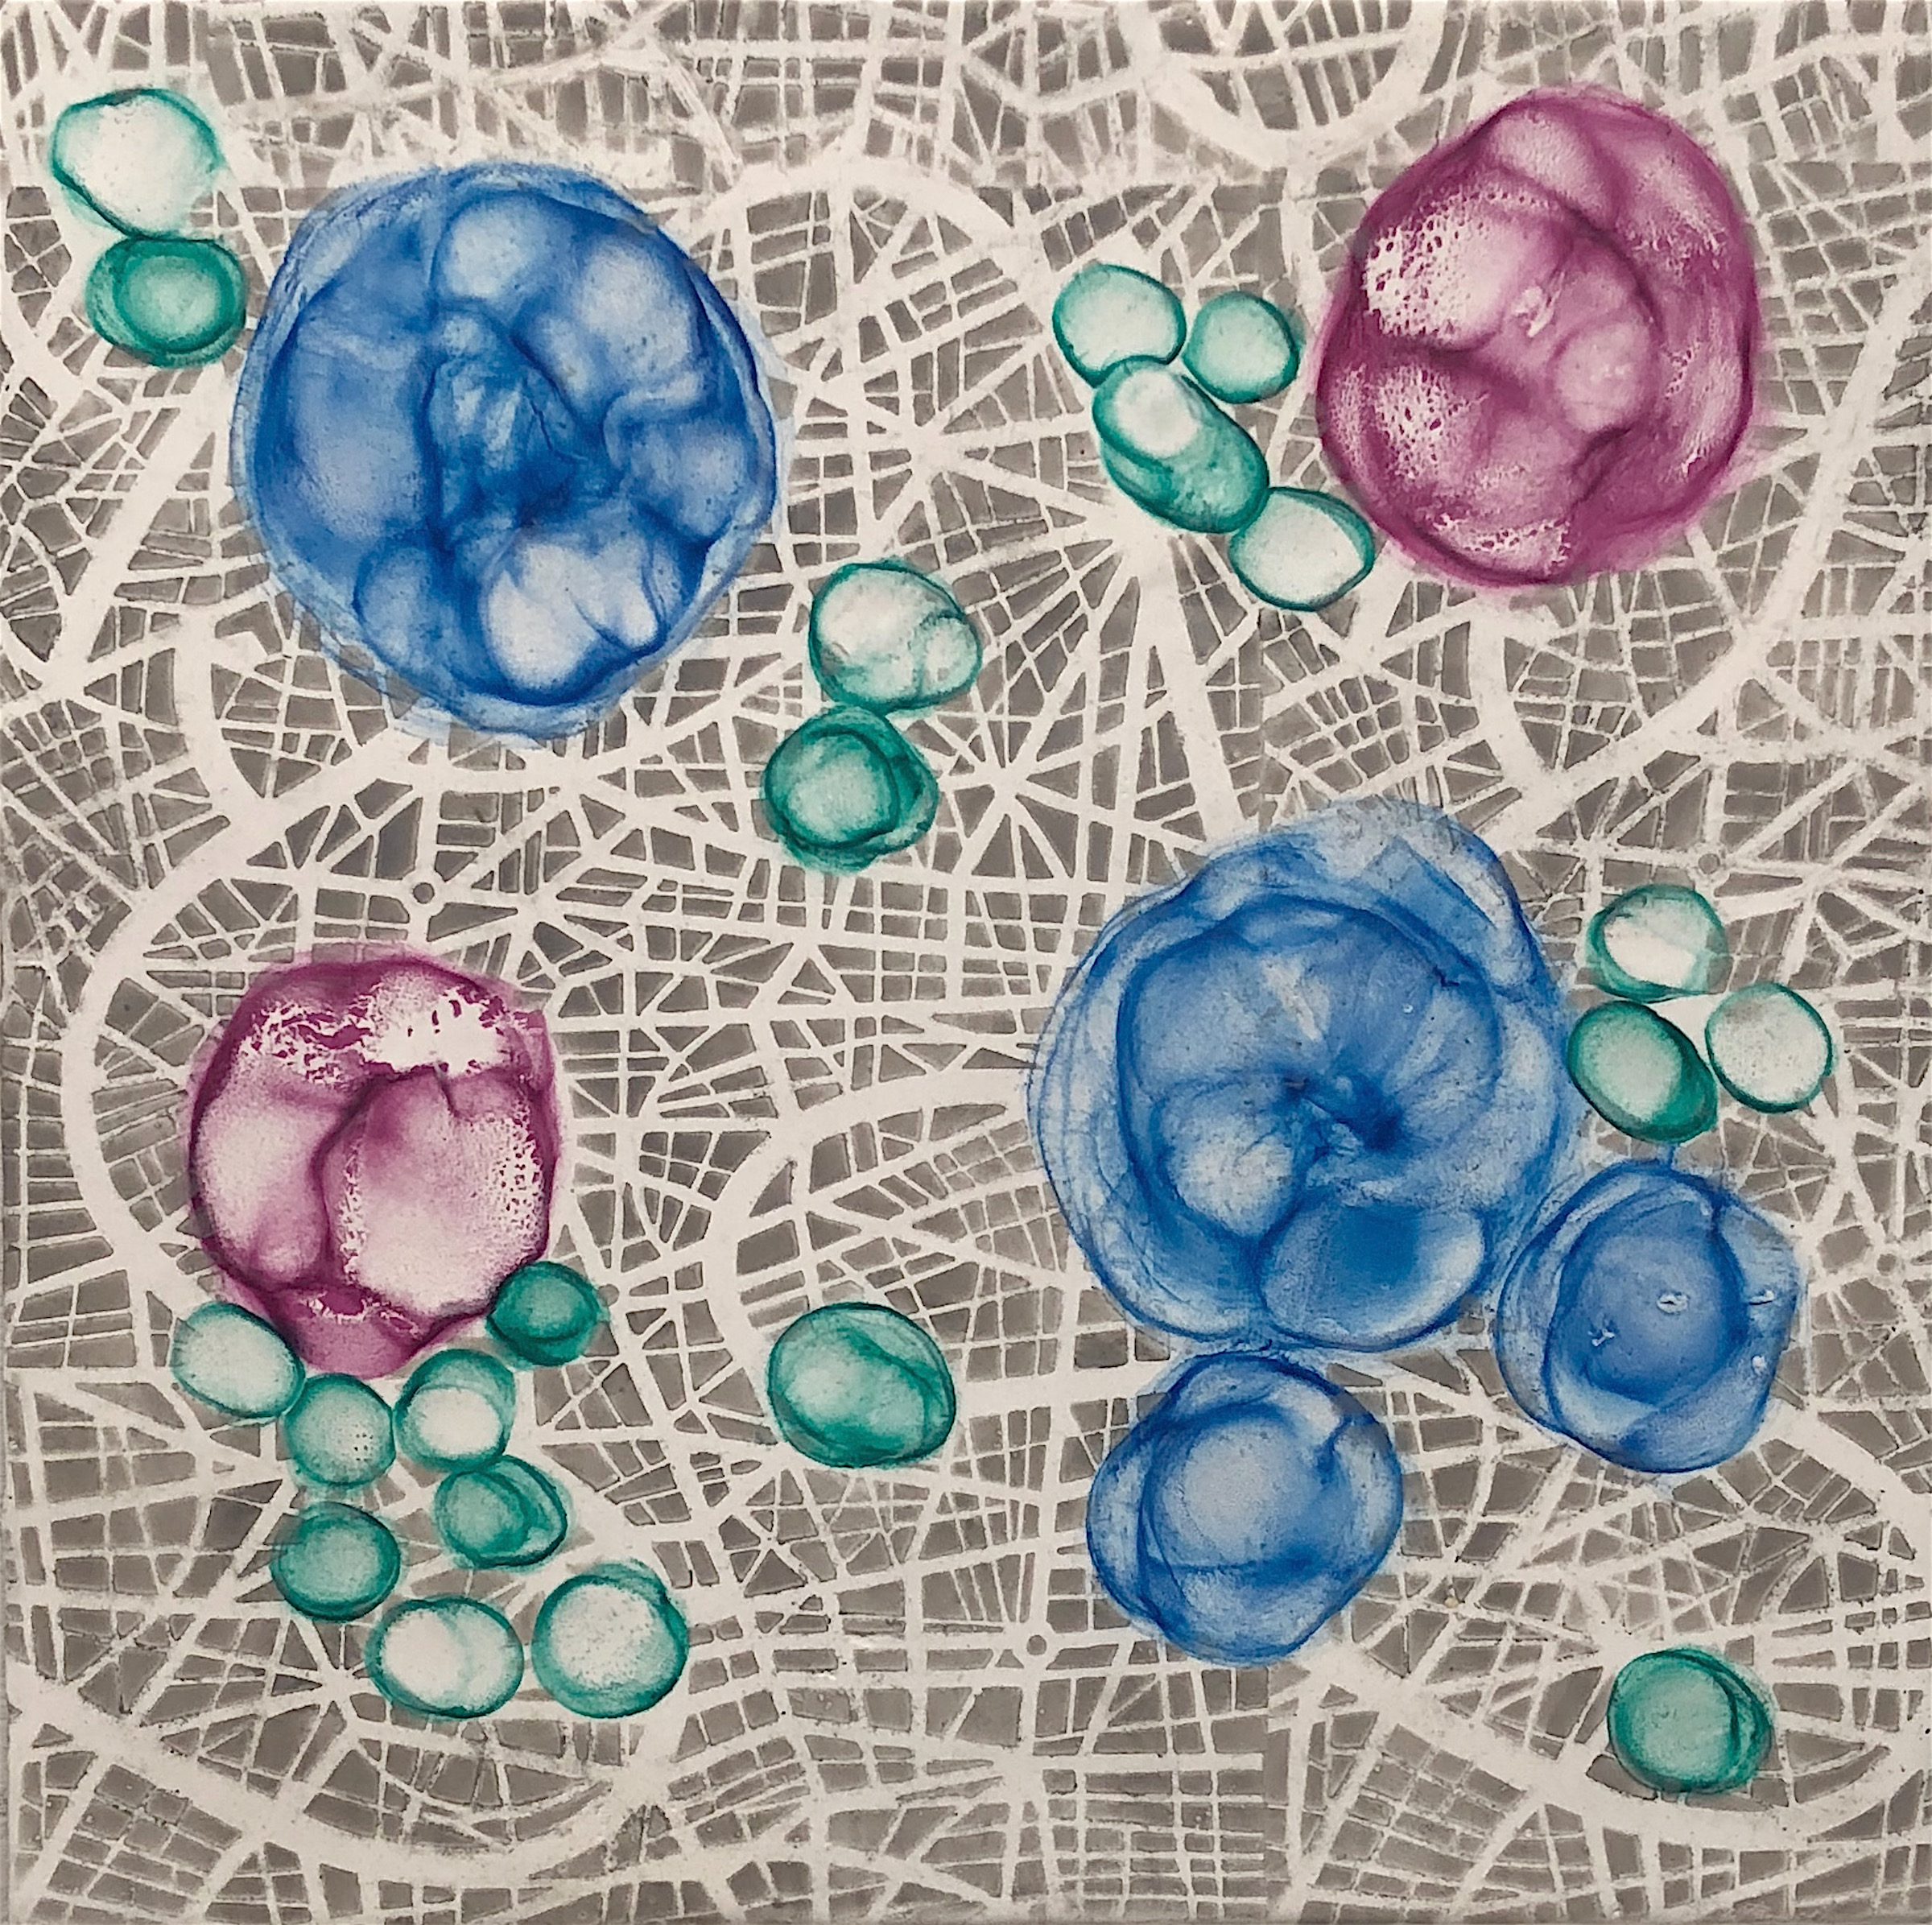 Hartung,  Bio Networks 6 , Encaustic, pastel, 12x12